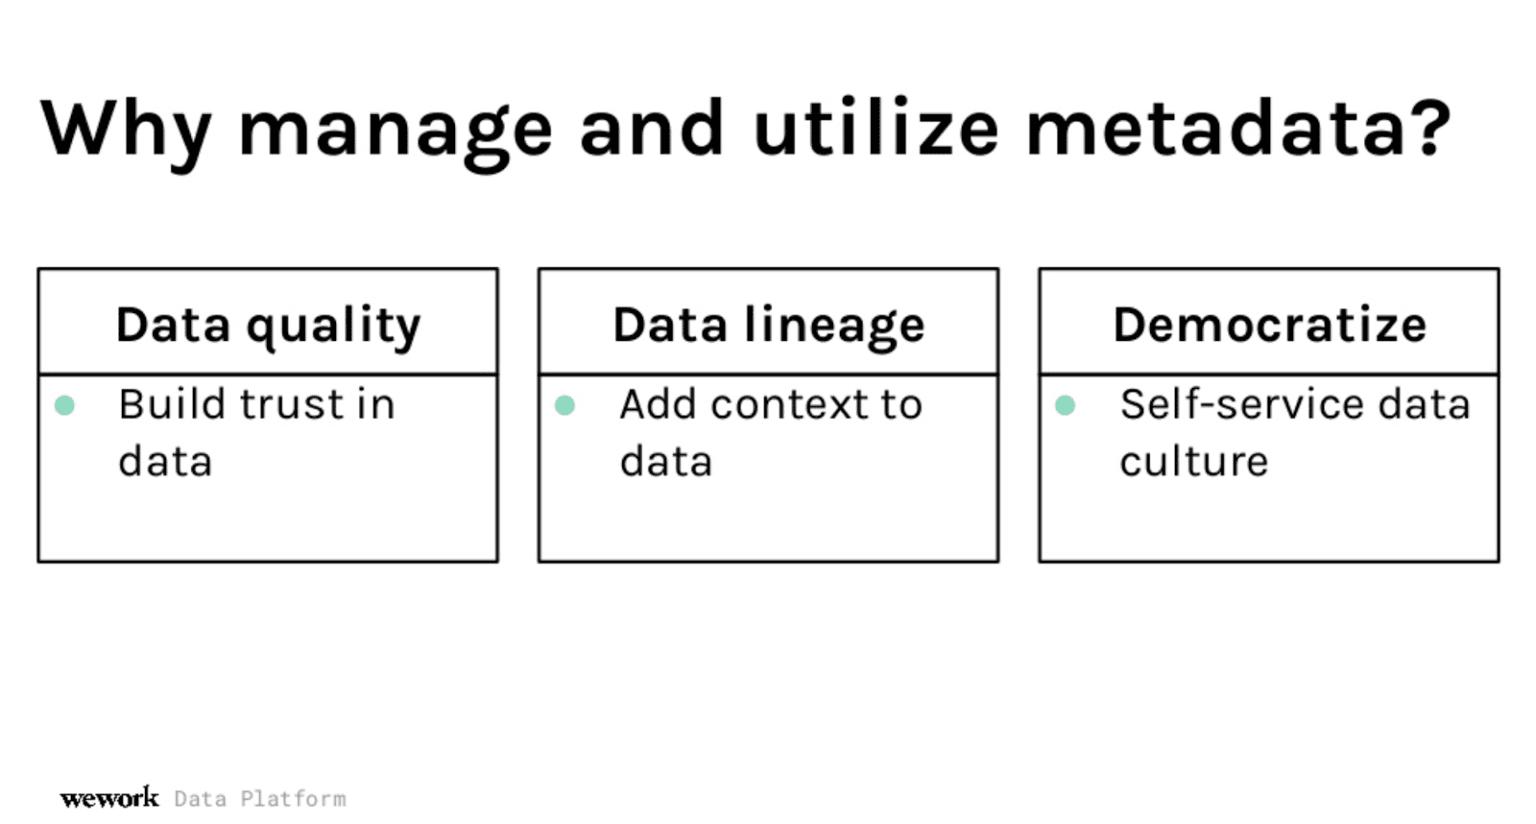 marquez-why-manage-and-utilize-metadata